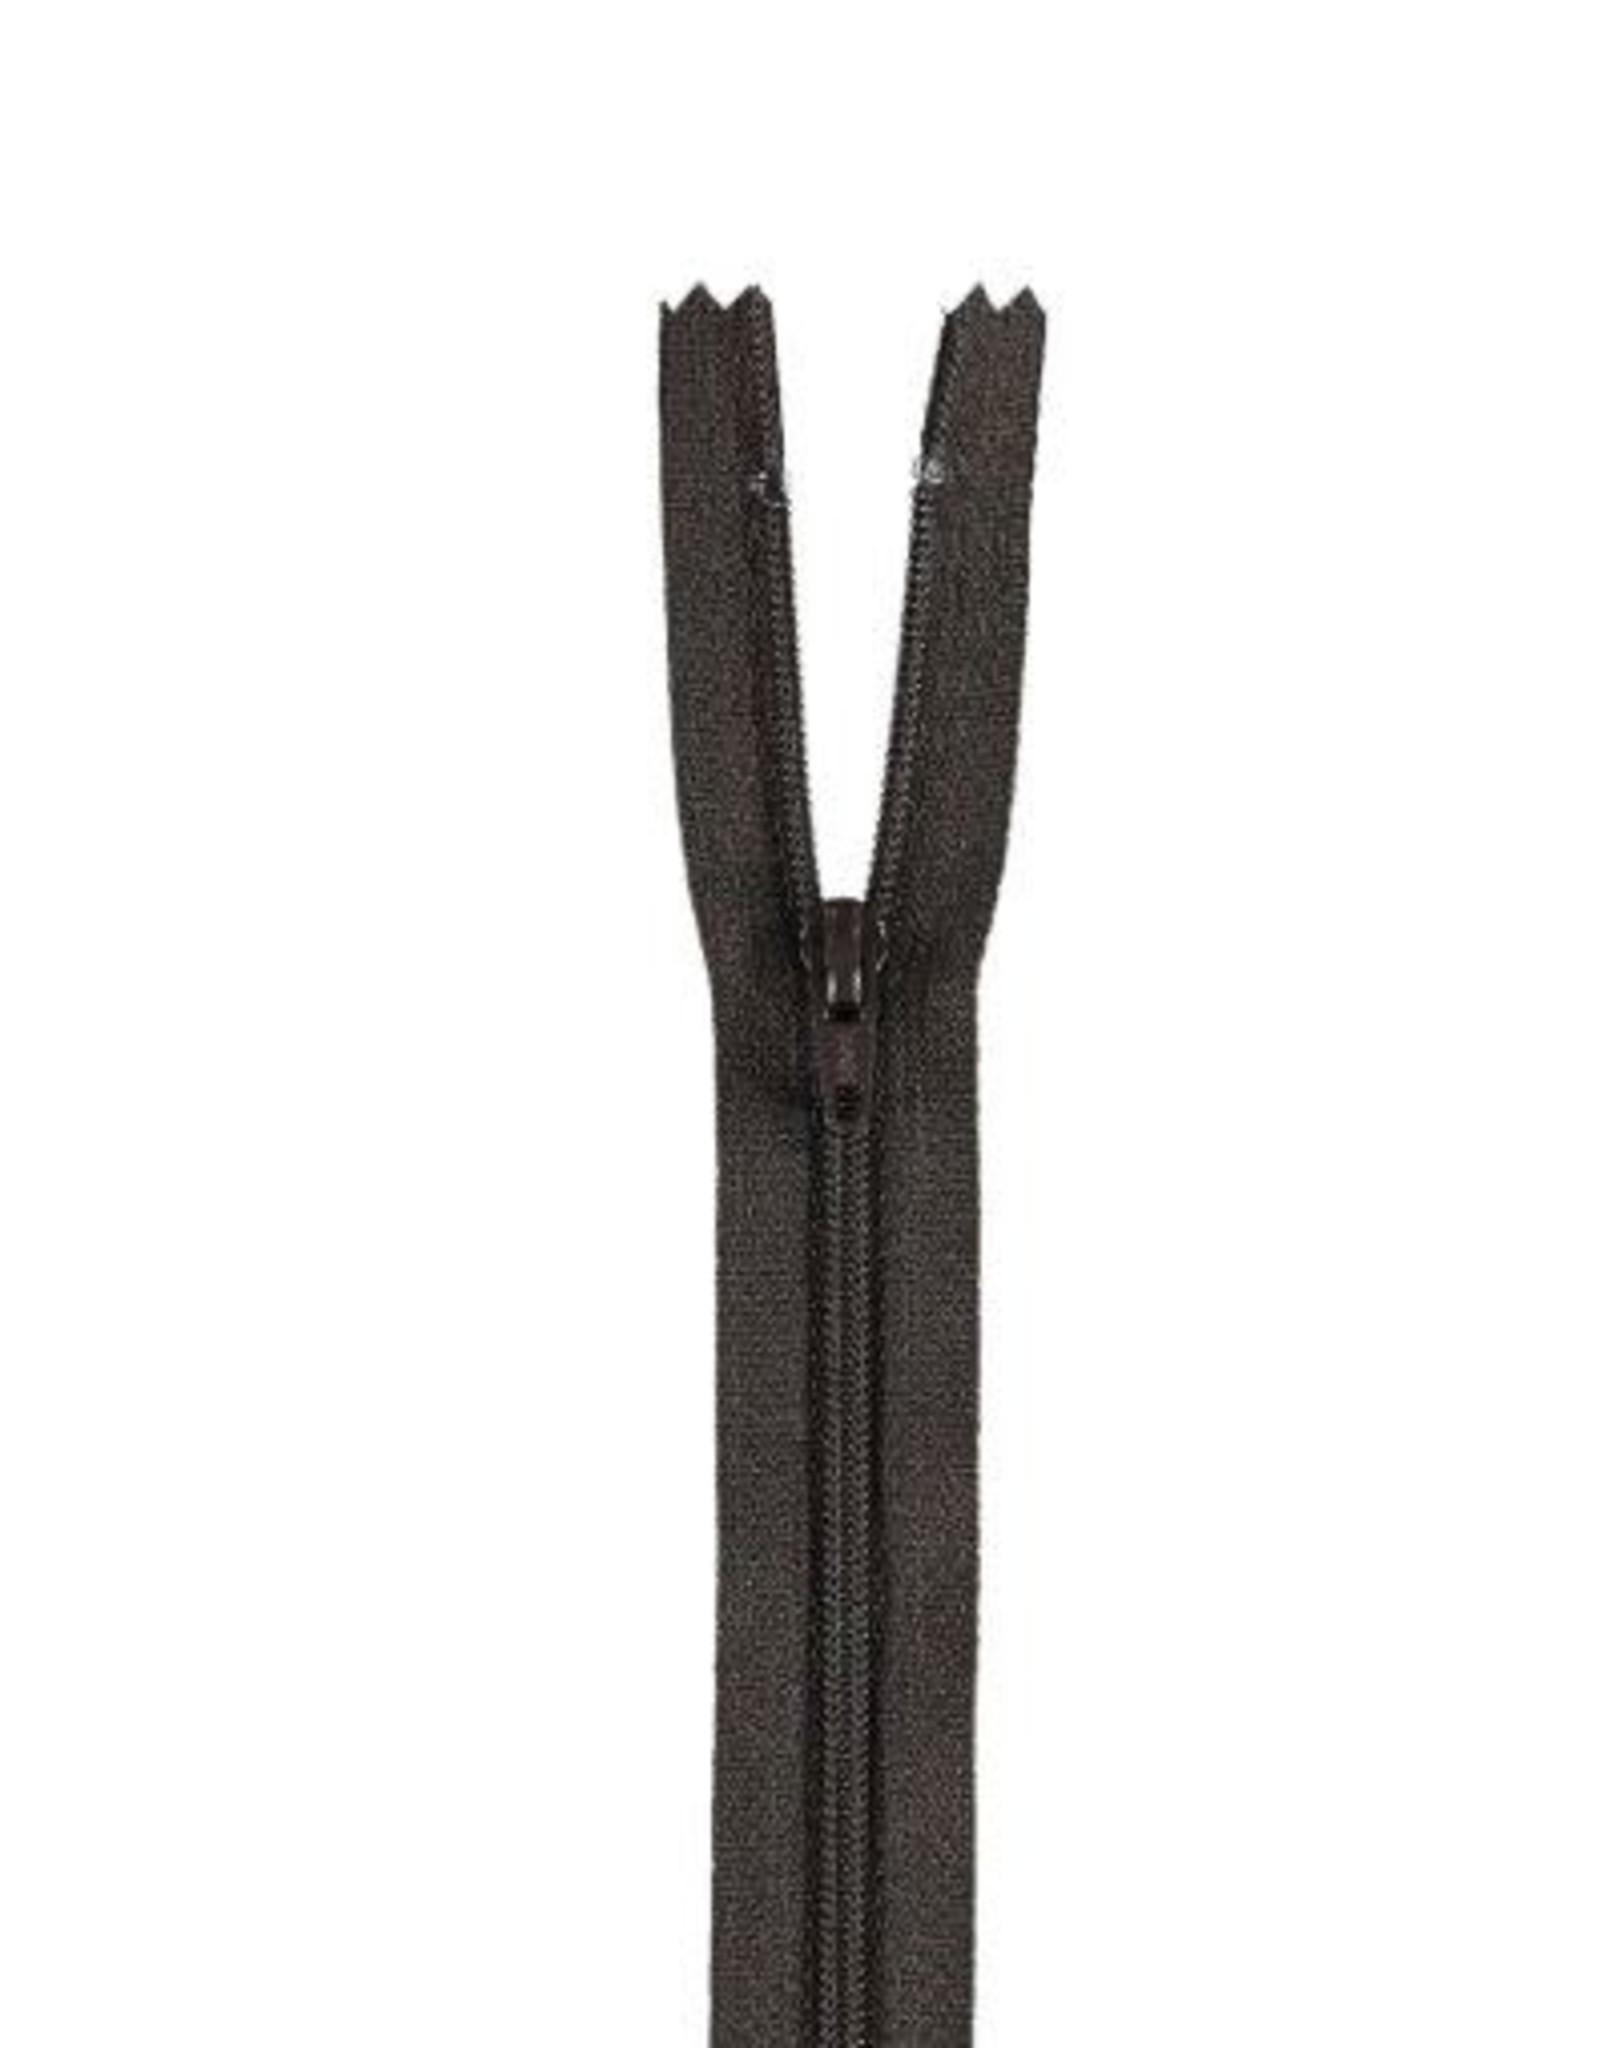 YKK Spiraalrits niet-DB 3mm zwart bruin 916-22cm